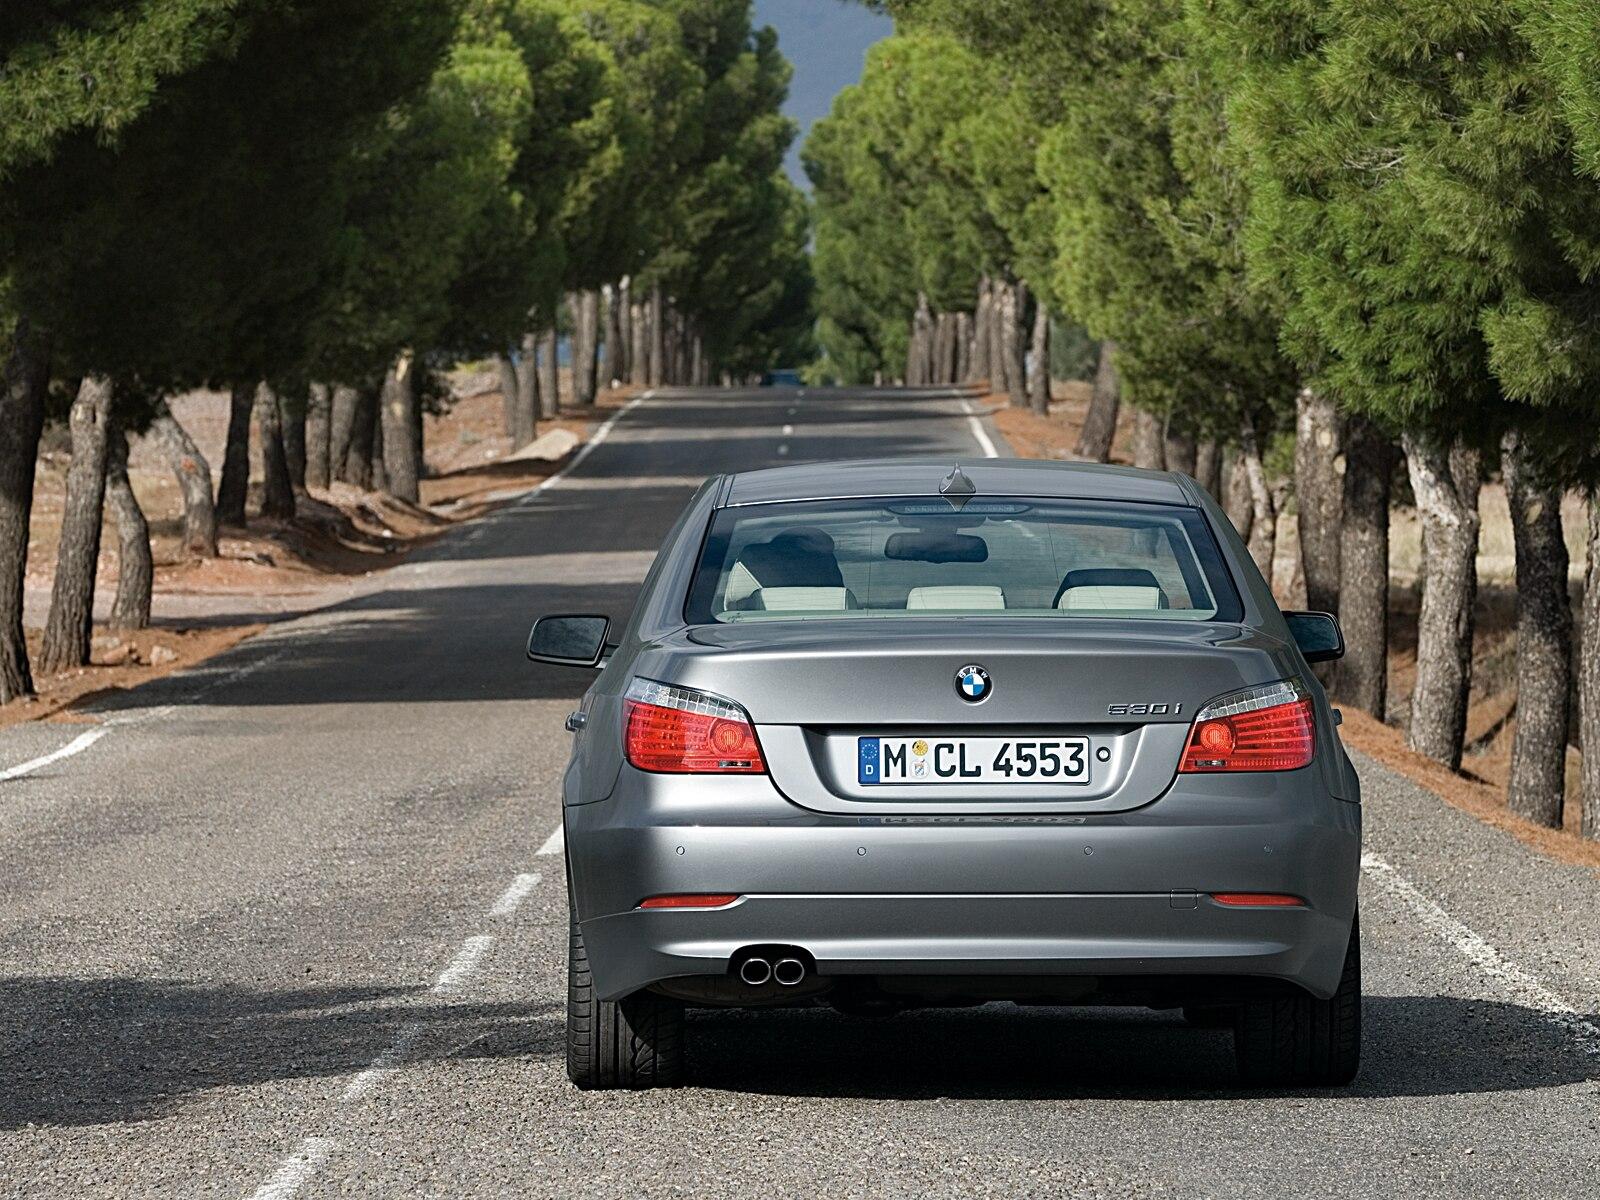 2009 BMW 535i Sedan  BMW Luxury Sedan Review  Automobile Magazine